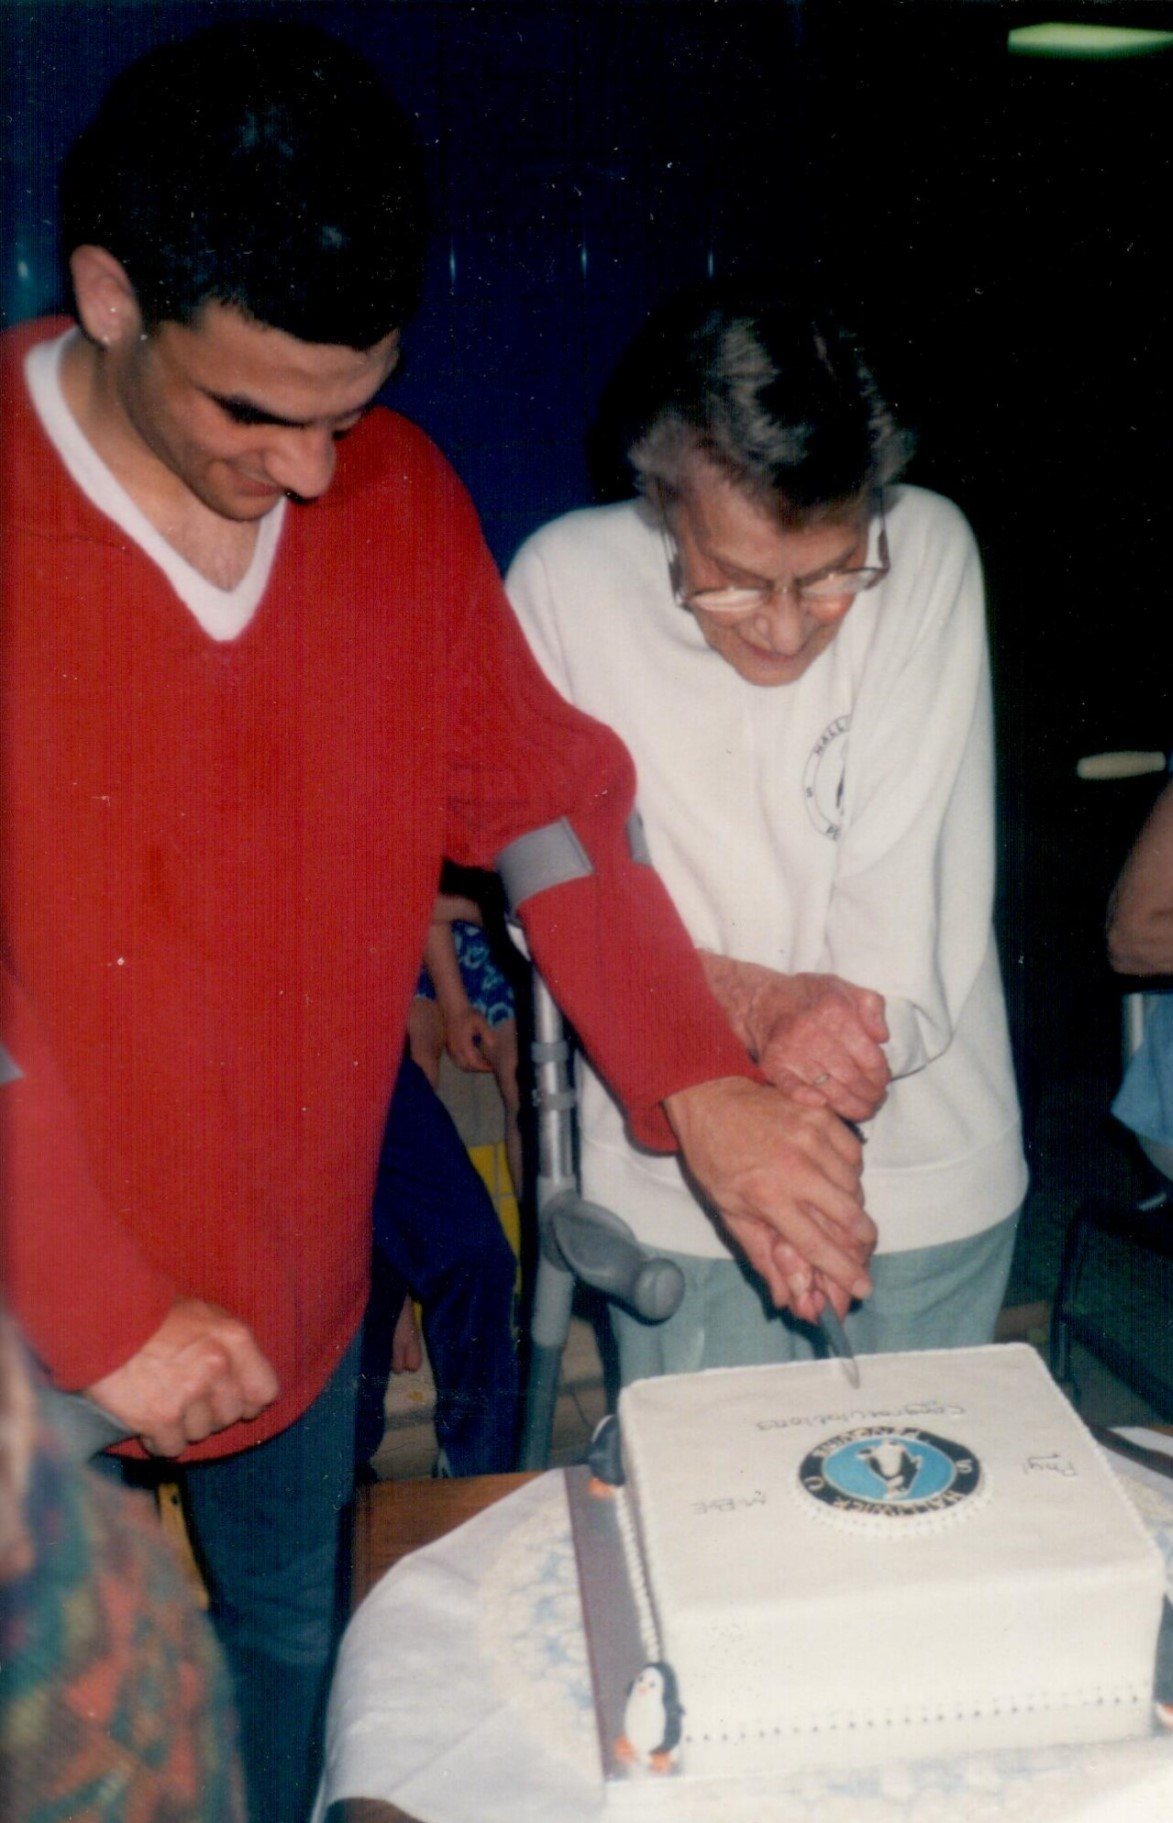 Cutting Cake at Pool (MBE Celebration)